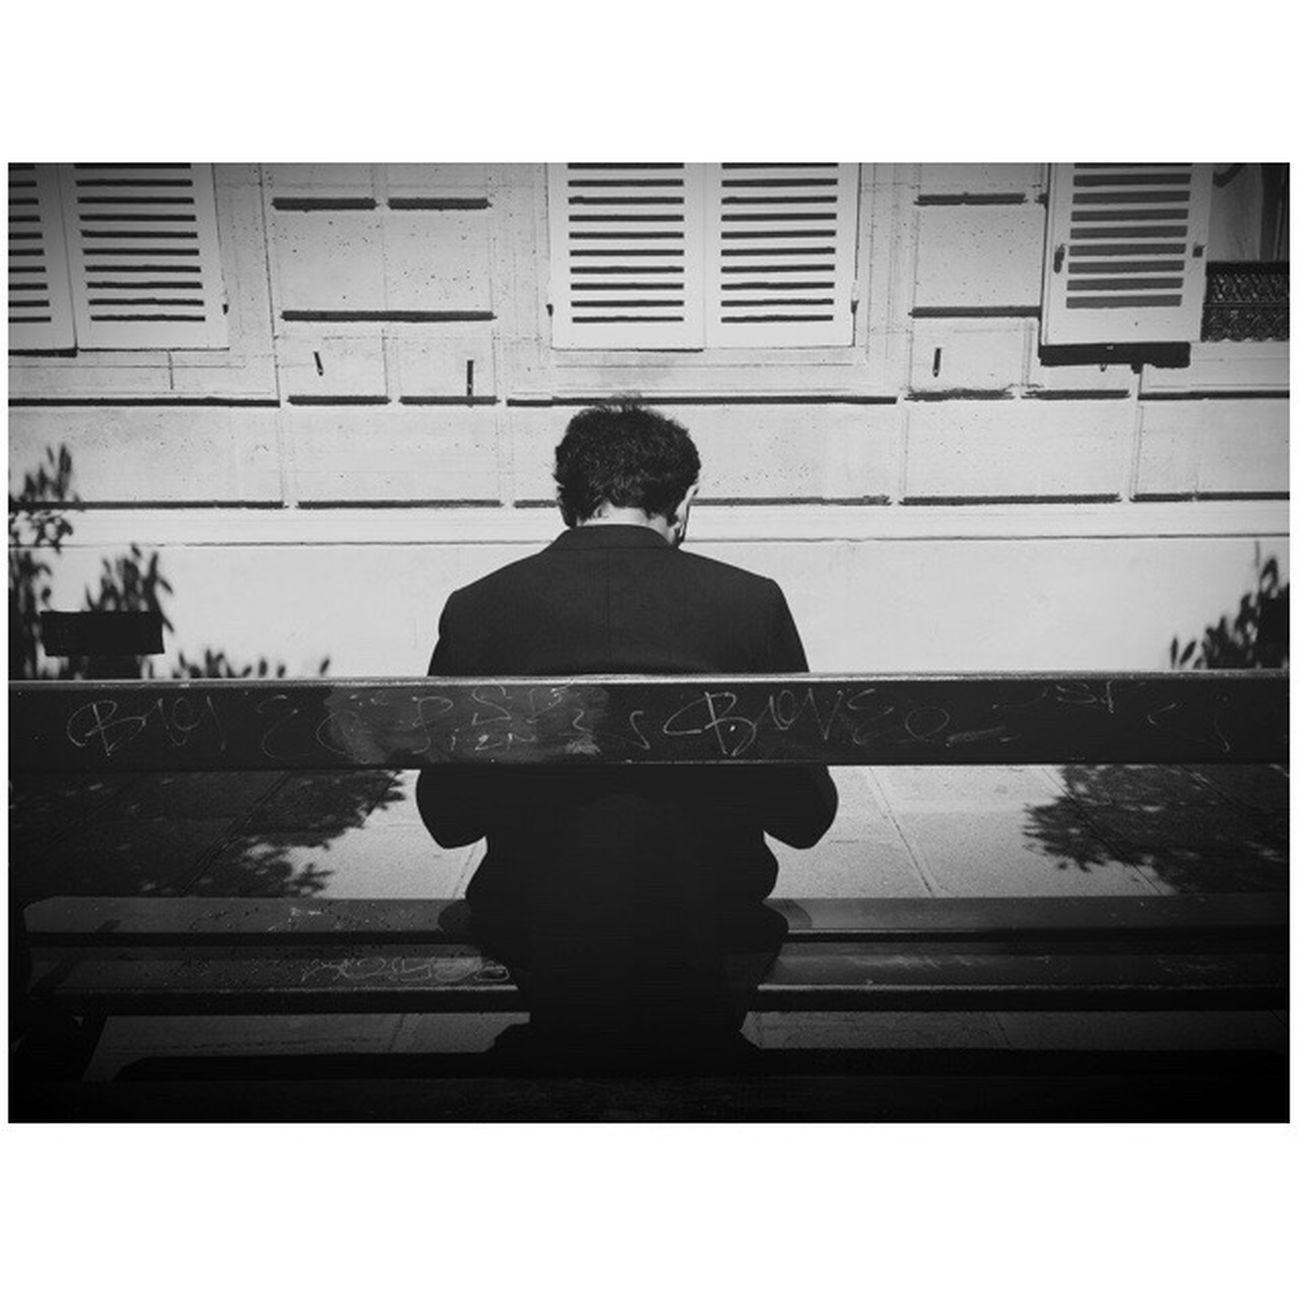 Mobile Camera Club Mobilecameraclub The SmART Gallery Black & White Blackandwhite B&w Blackandwhite Photography Parisian Lifestyles City Street EyeEm Best Shots Street_photo_club Everybody Street Everybodystreet Streetphotography Paris City IPhoneography Taking Photos City Life Photo Of The Day AMPt - Shoot Or Die Smartphonephotography Parisian Connexion Wearethestreet